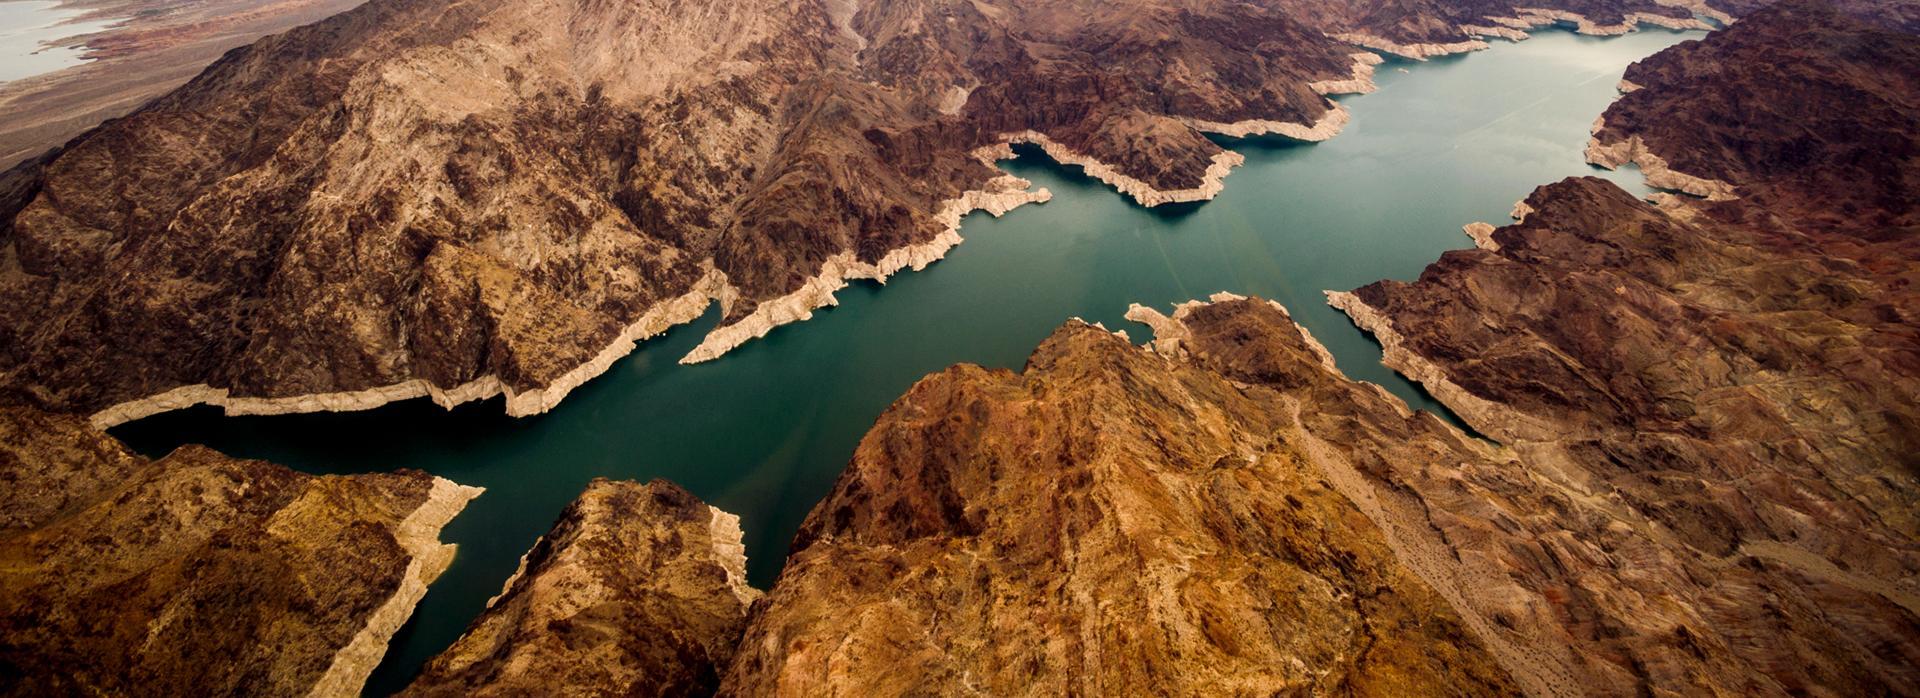 Lake Mead aerial